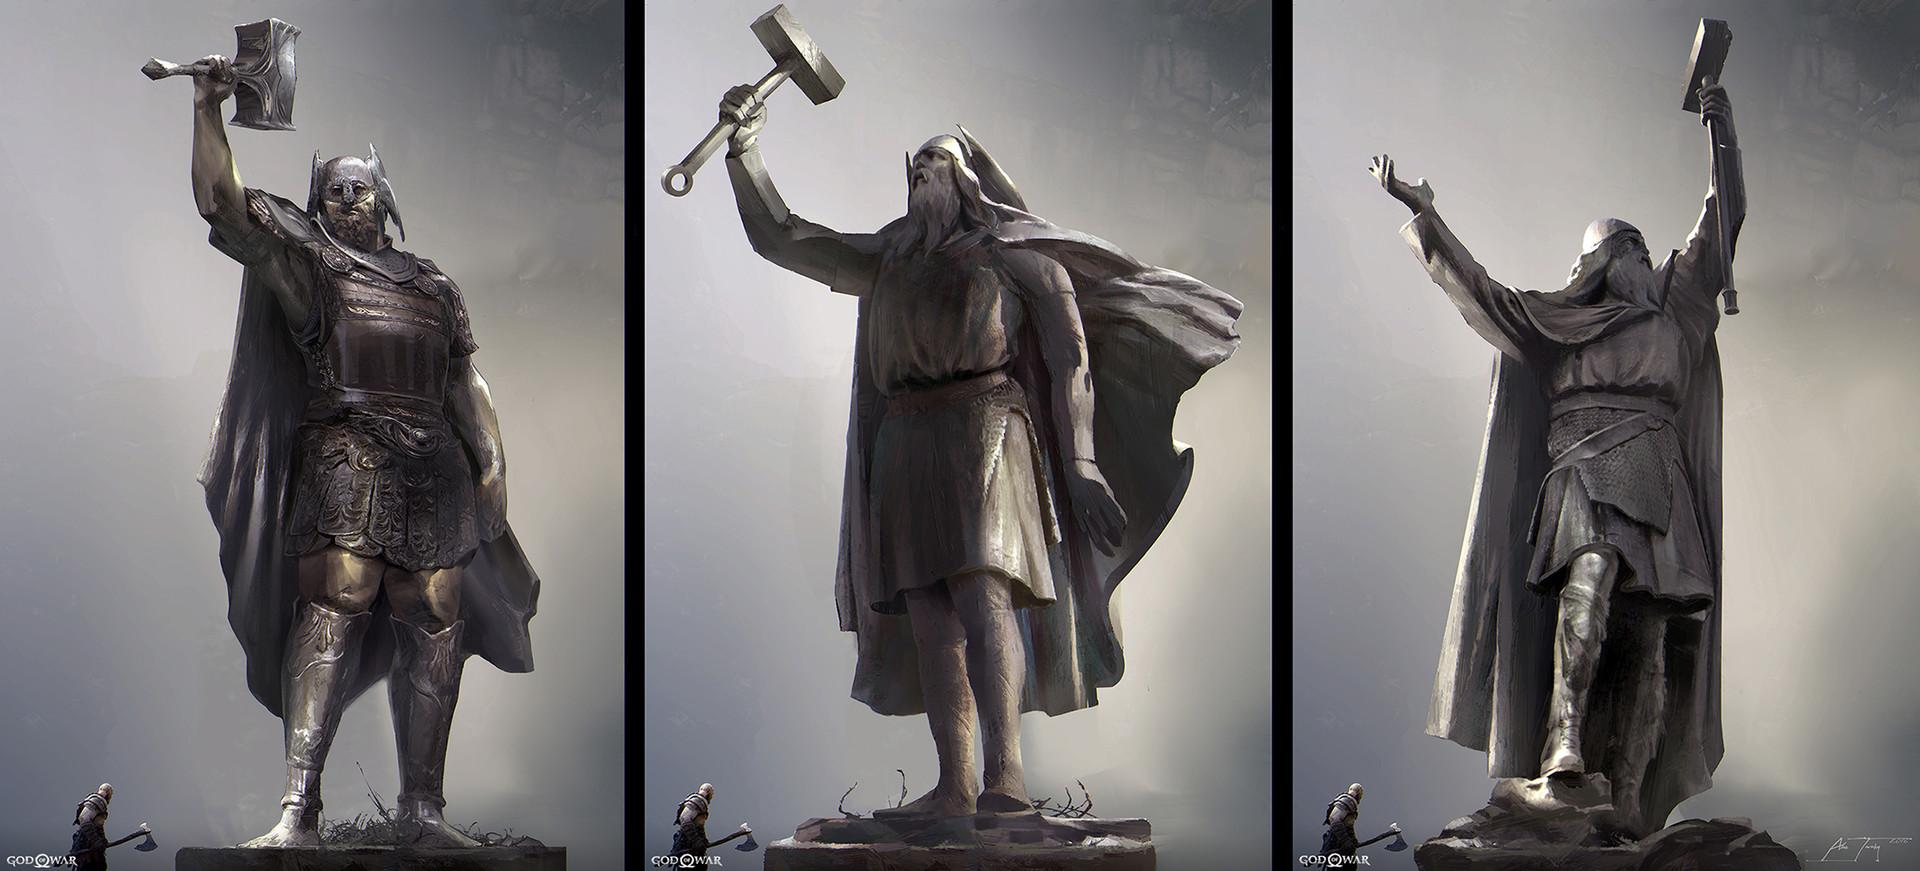 abe-taraky-statue-of-thor-abe-taraky-02.jpg